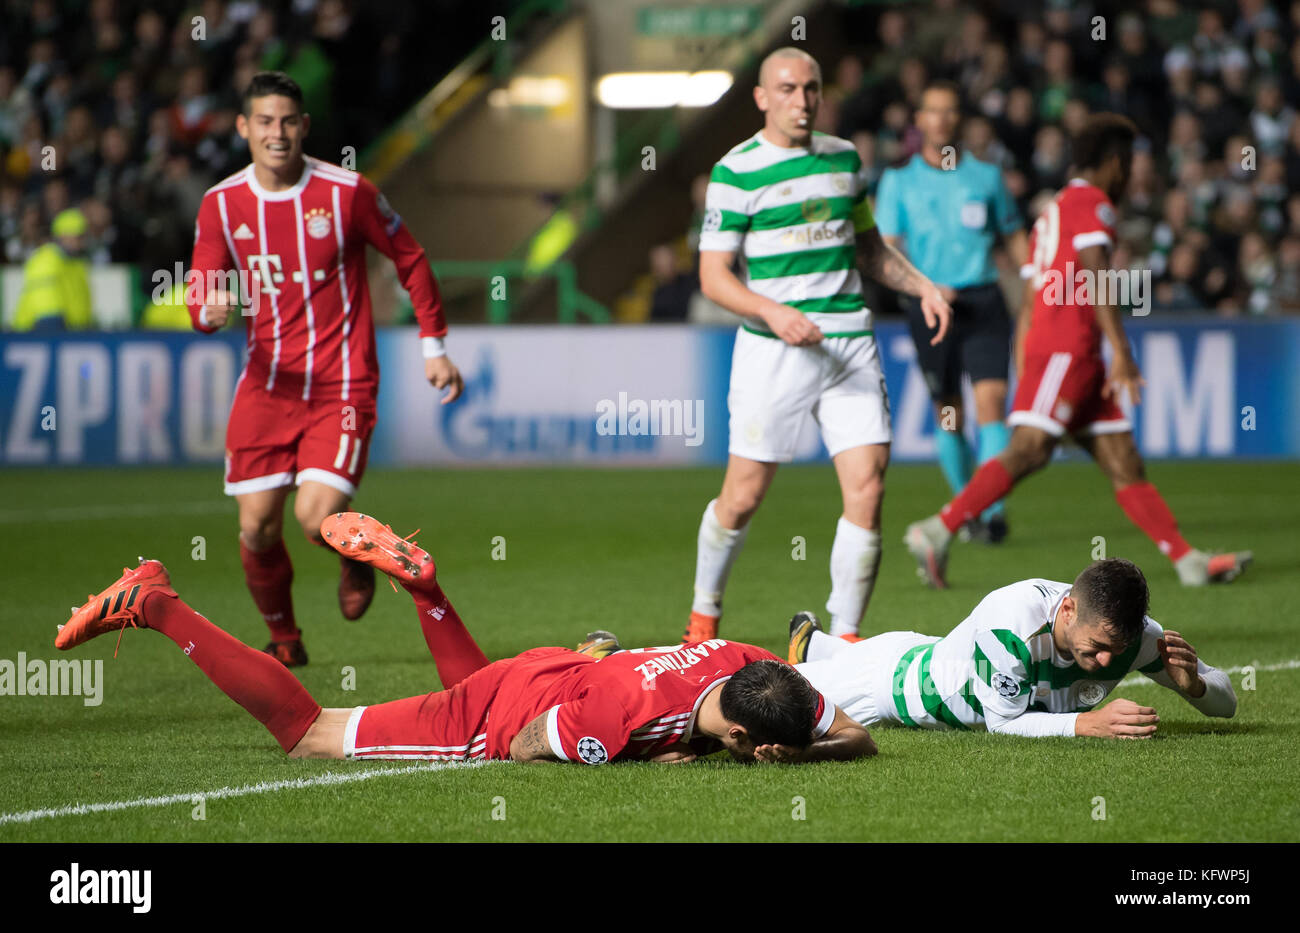 Glasgow, UK. 31st Oct, 2017. Javi Martinez (L) of Bayern and Glasgow's Nir Bitton lie on the ground injured - Stock Image